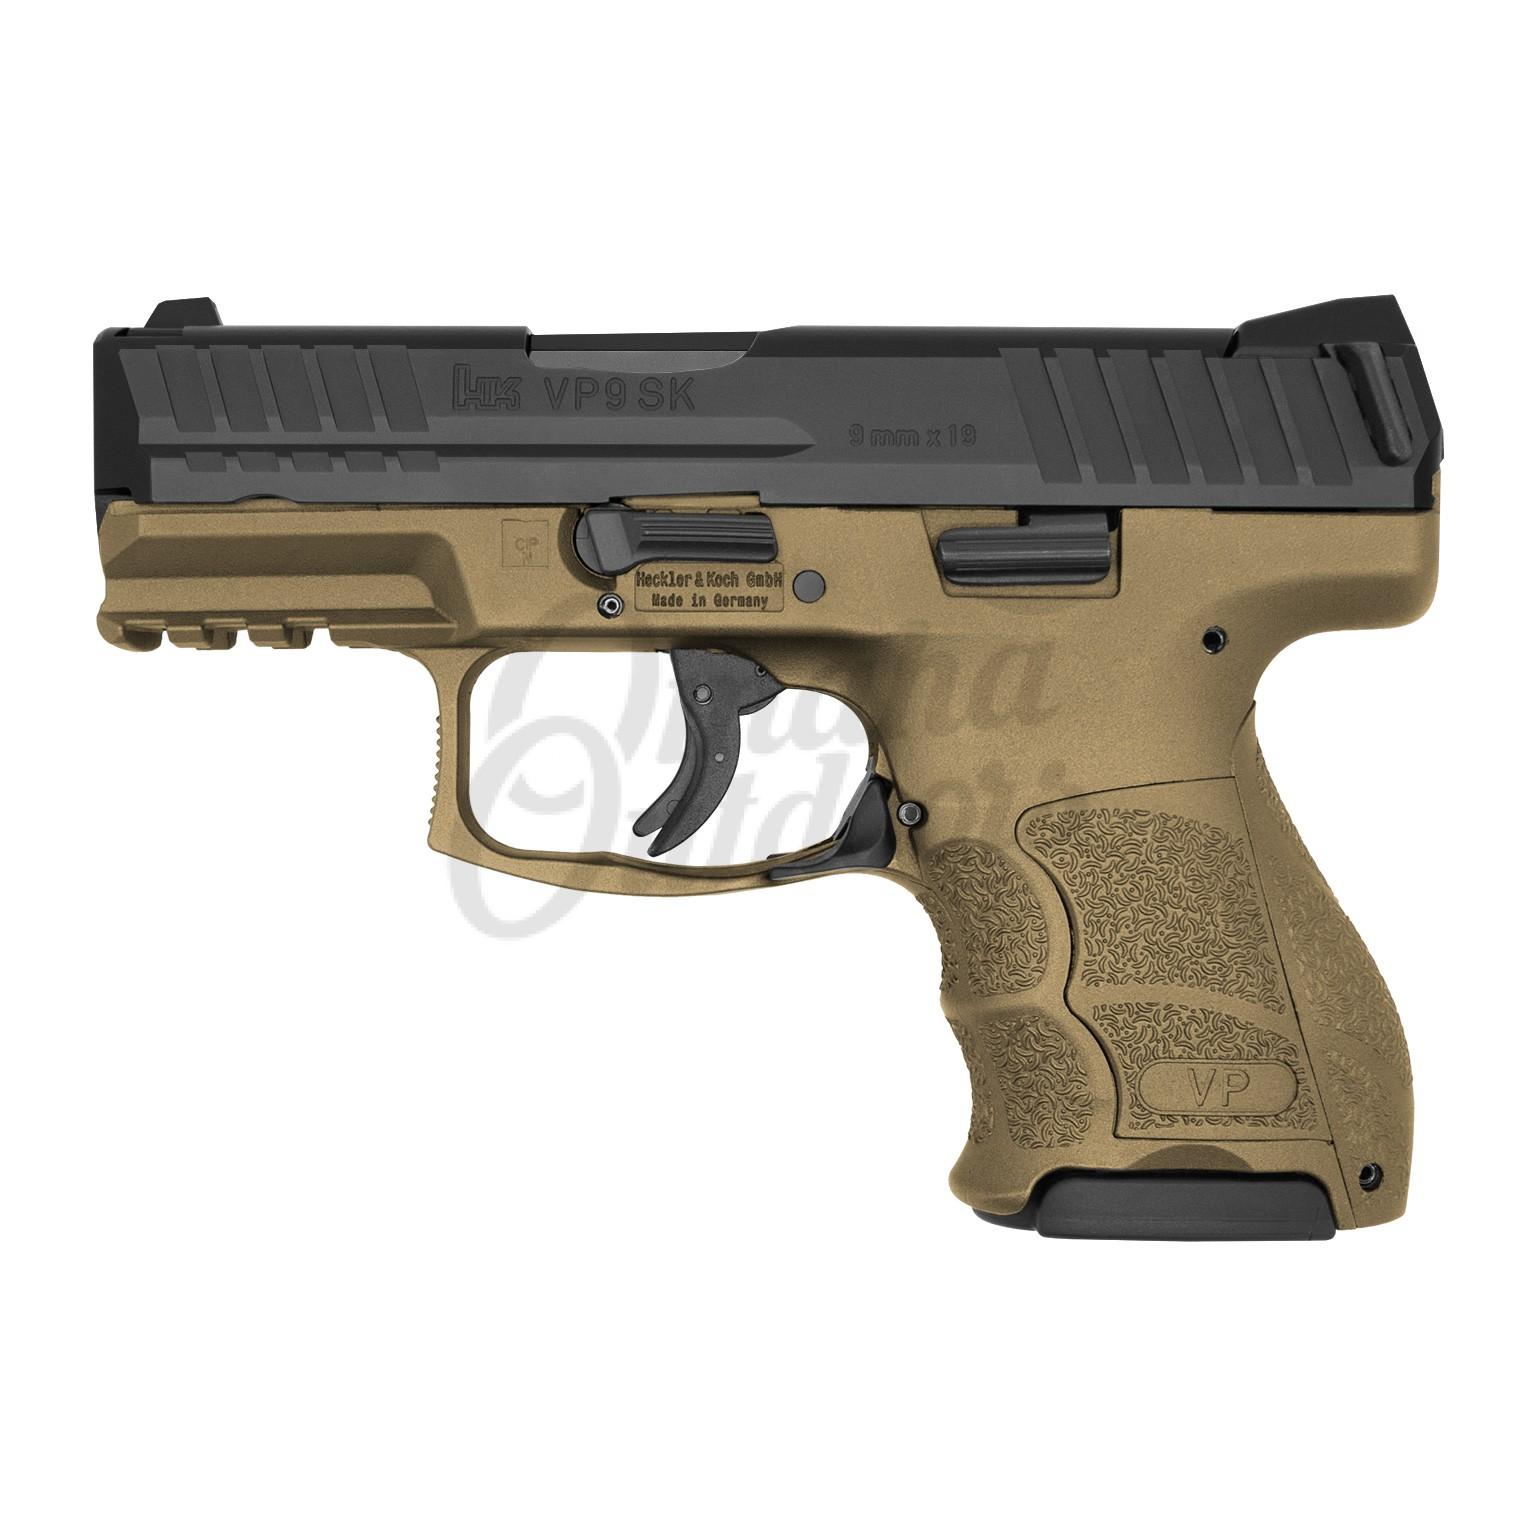 HK VP9SK LE Burnt Bronze Pistol 10 RD 9mm Night Sights